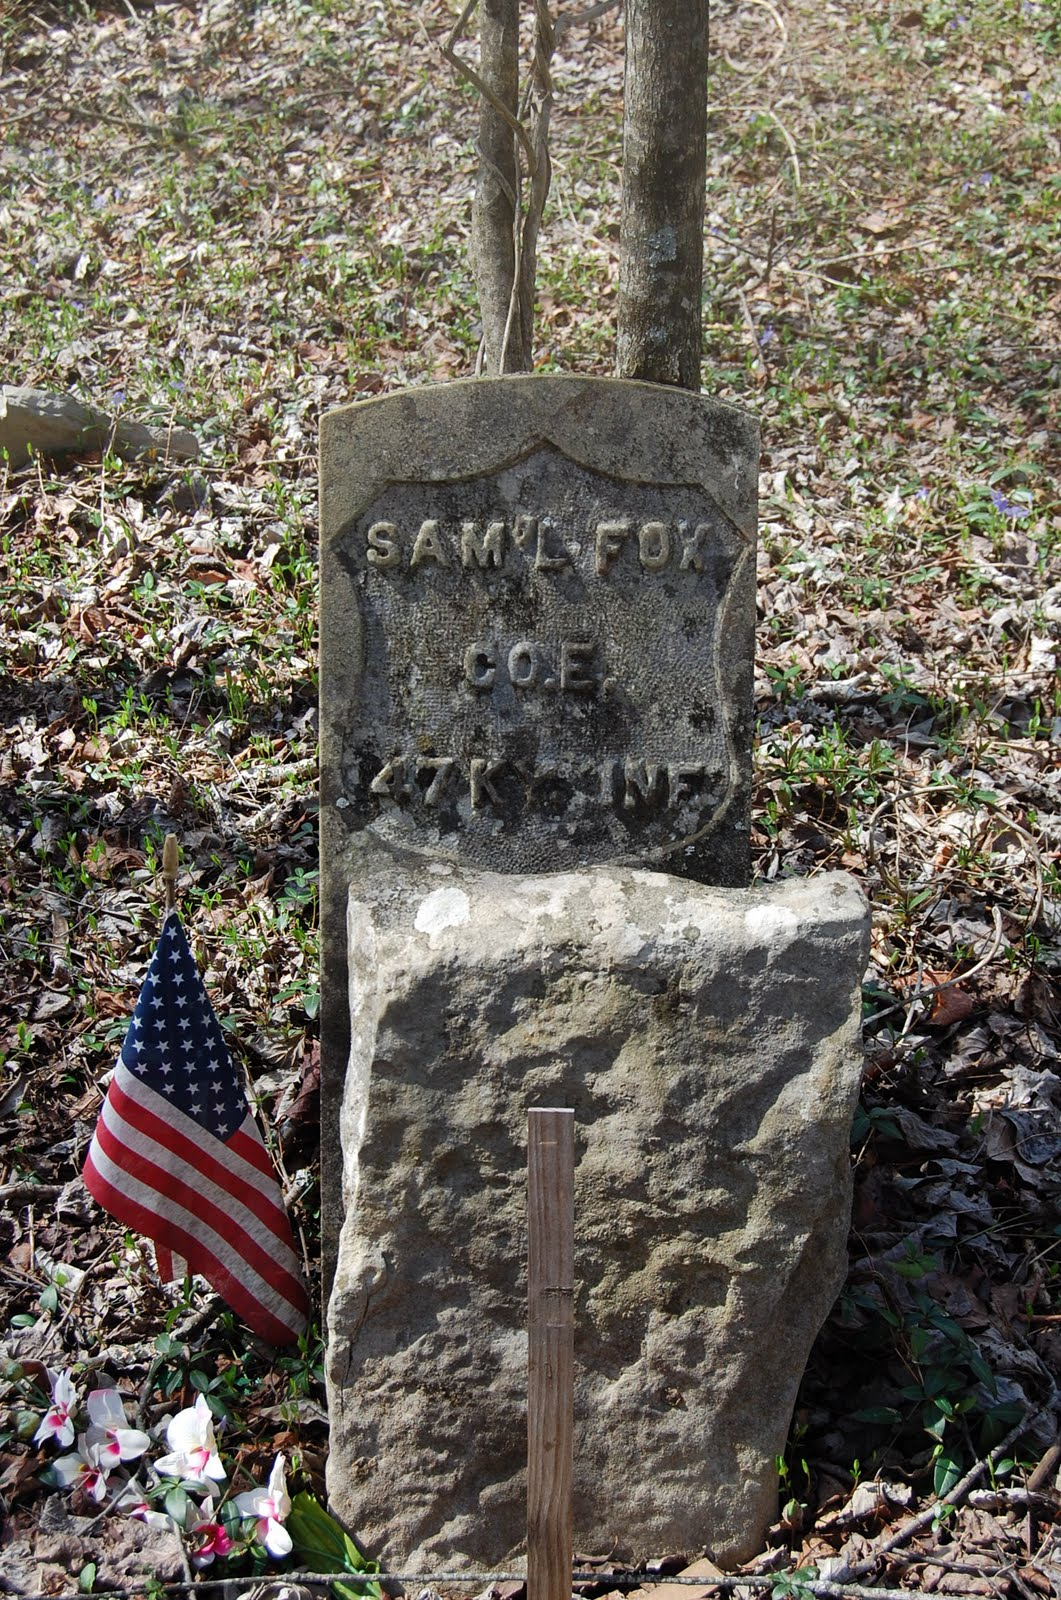 http://3.bp.blogspot.com/-AMeNviVY3BQ/TZ_BrYgeVdI/AAAAAAAAAJg/GhnJpak-_04/s1600/Headstone+-+Fox%252C+Sam%2527l+-+John+Reece+Cemetery.JPG